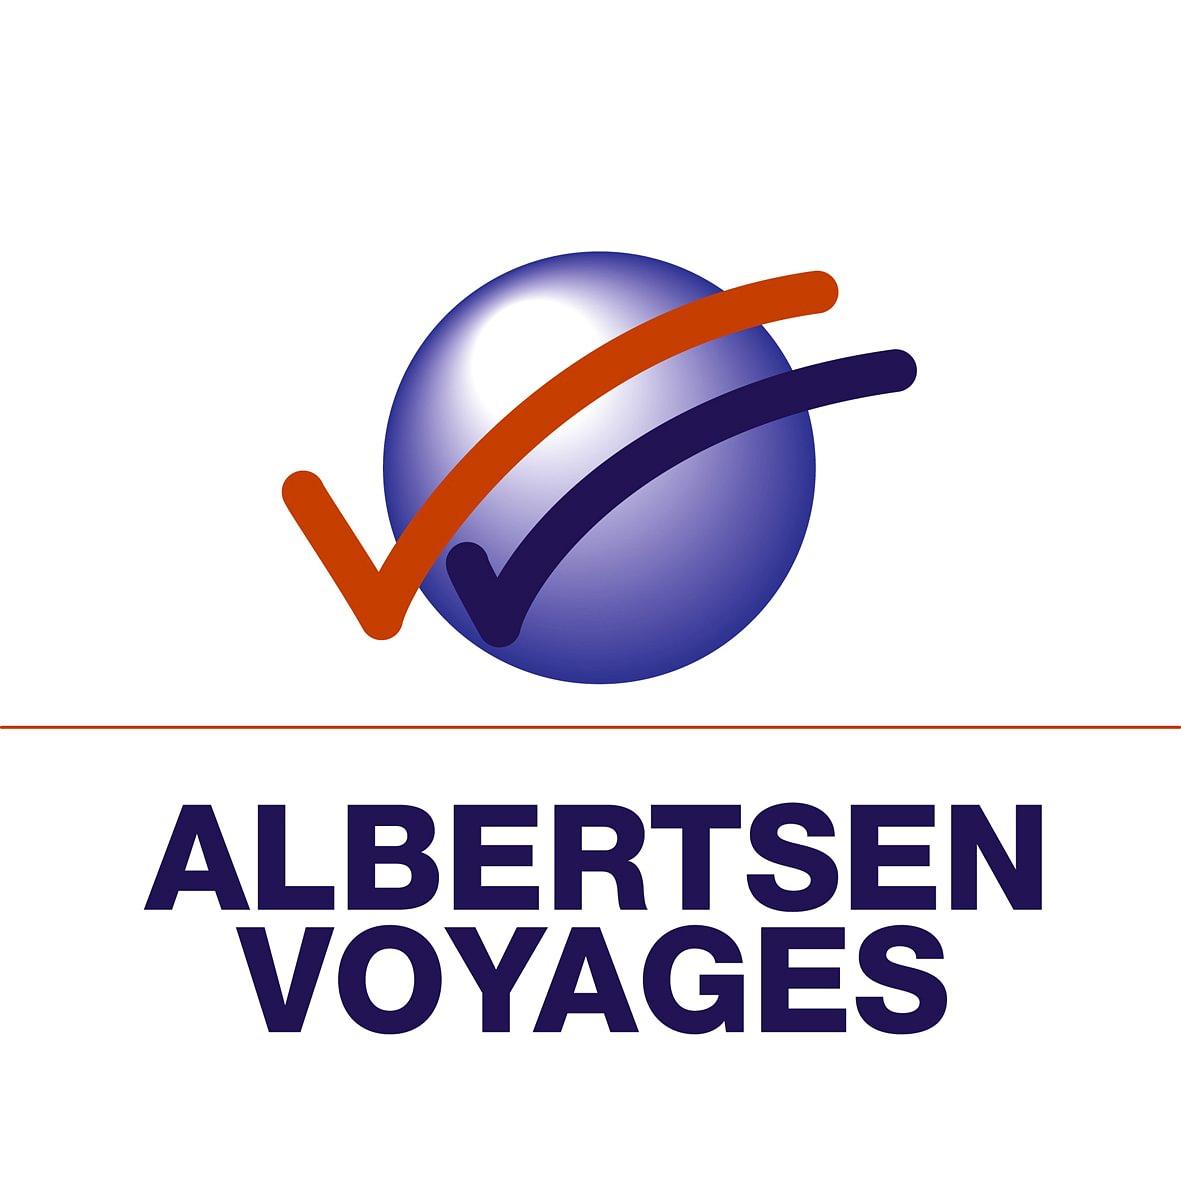 Albertsen Voyages SA